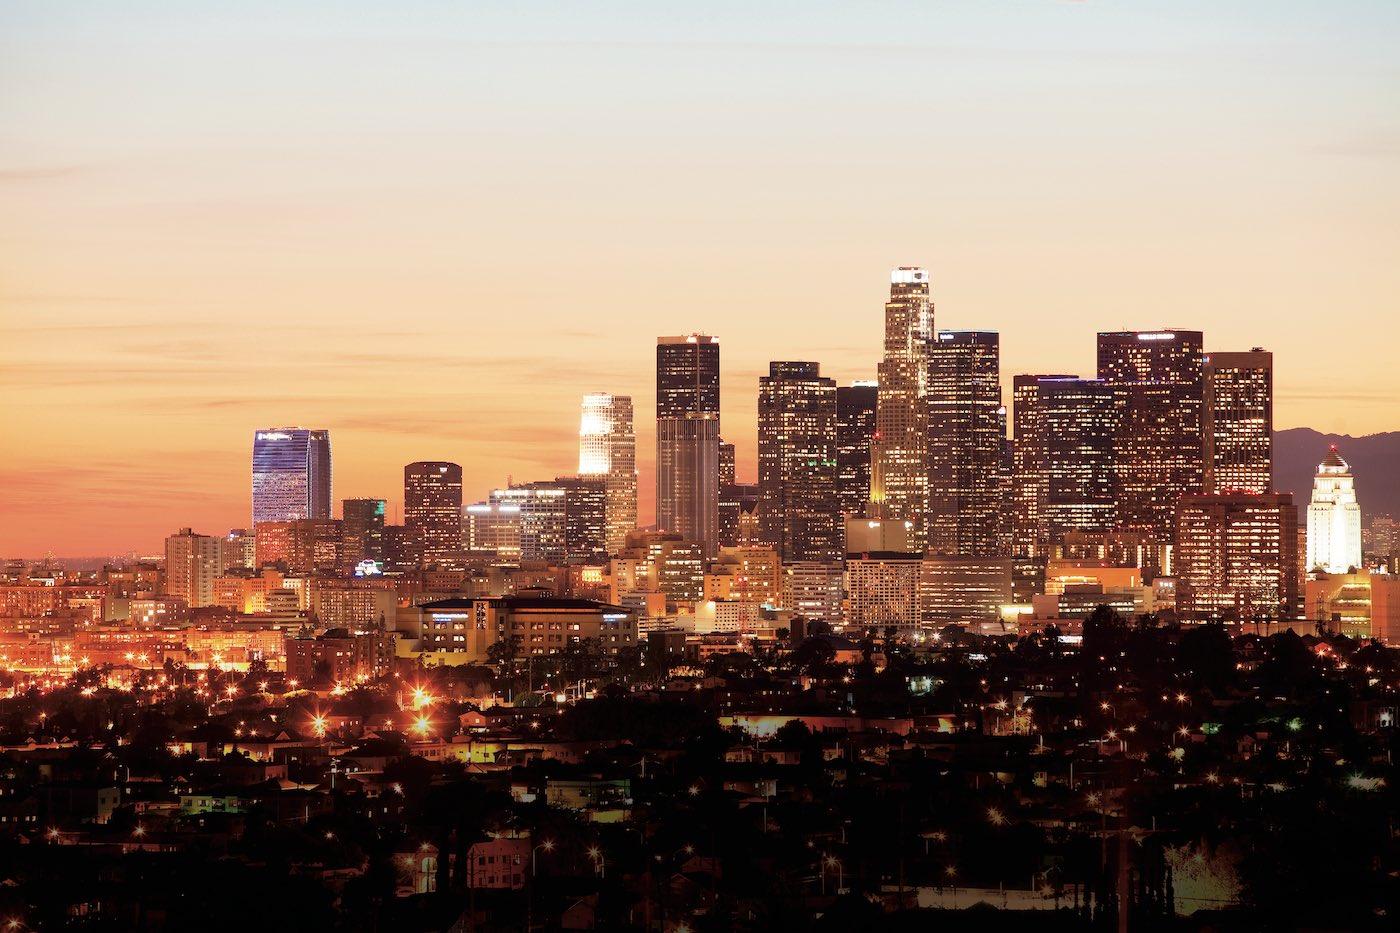 East Hollywood, herencia cultural del mundo